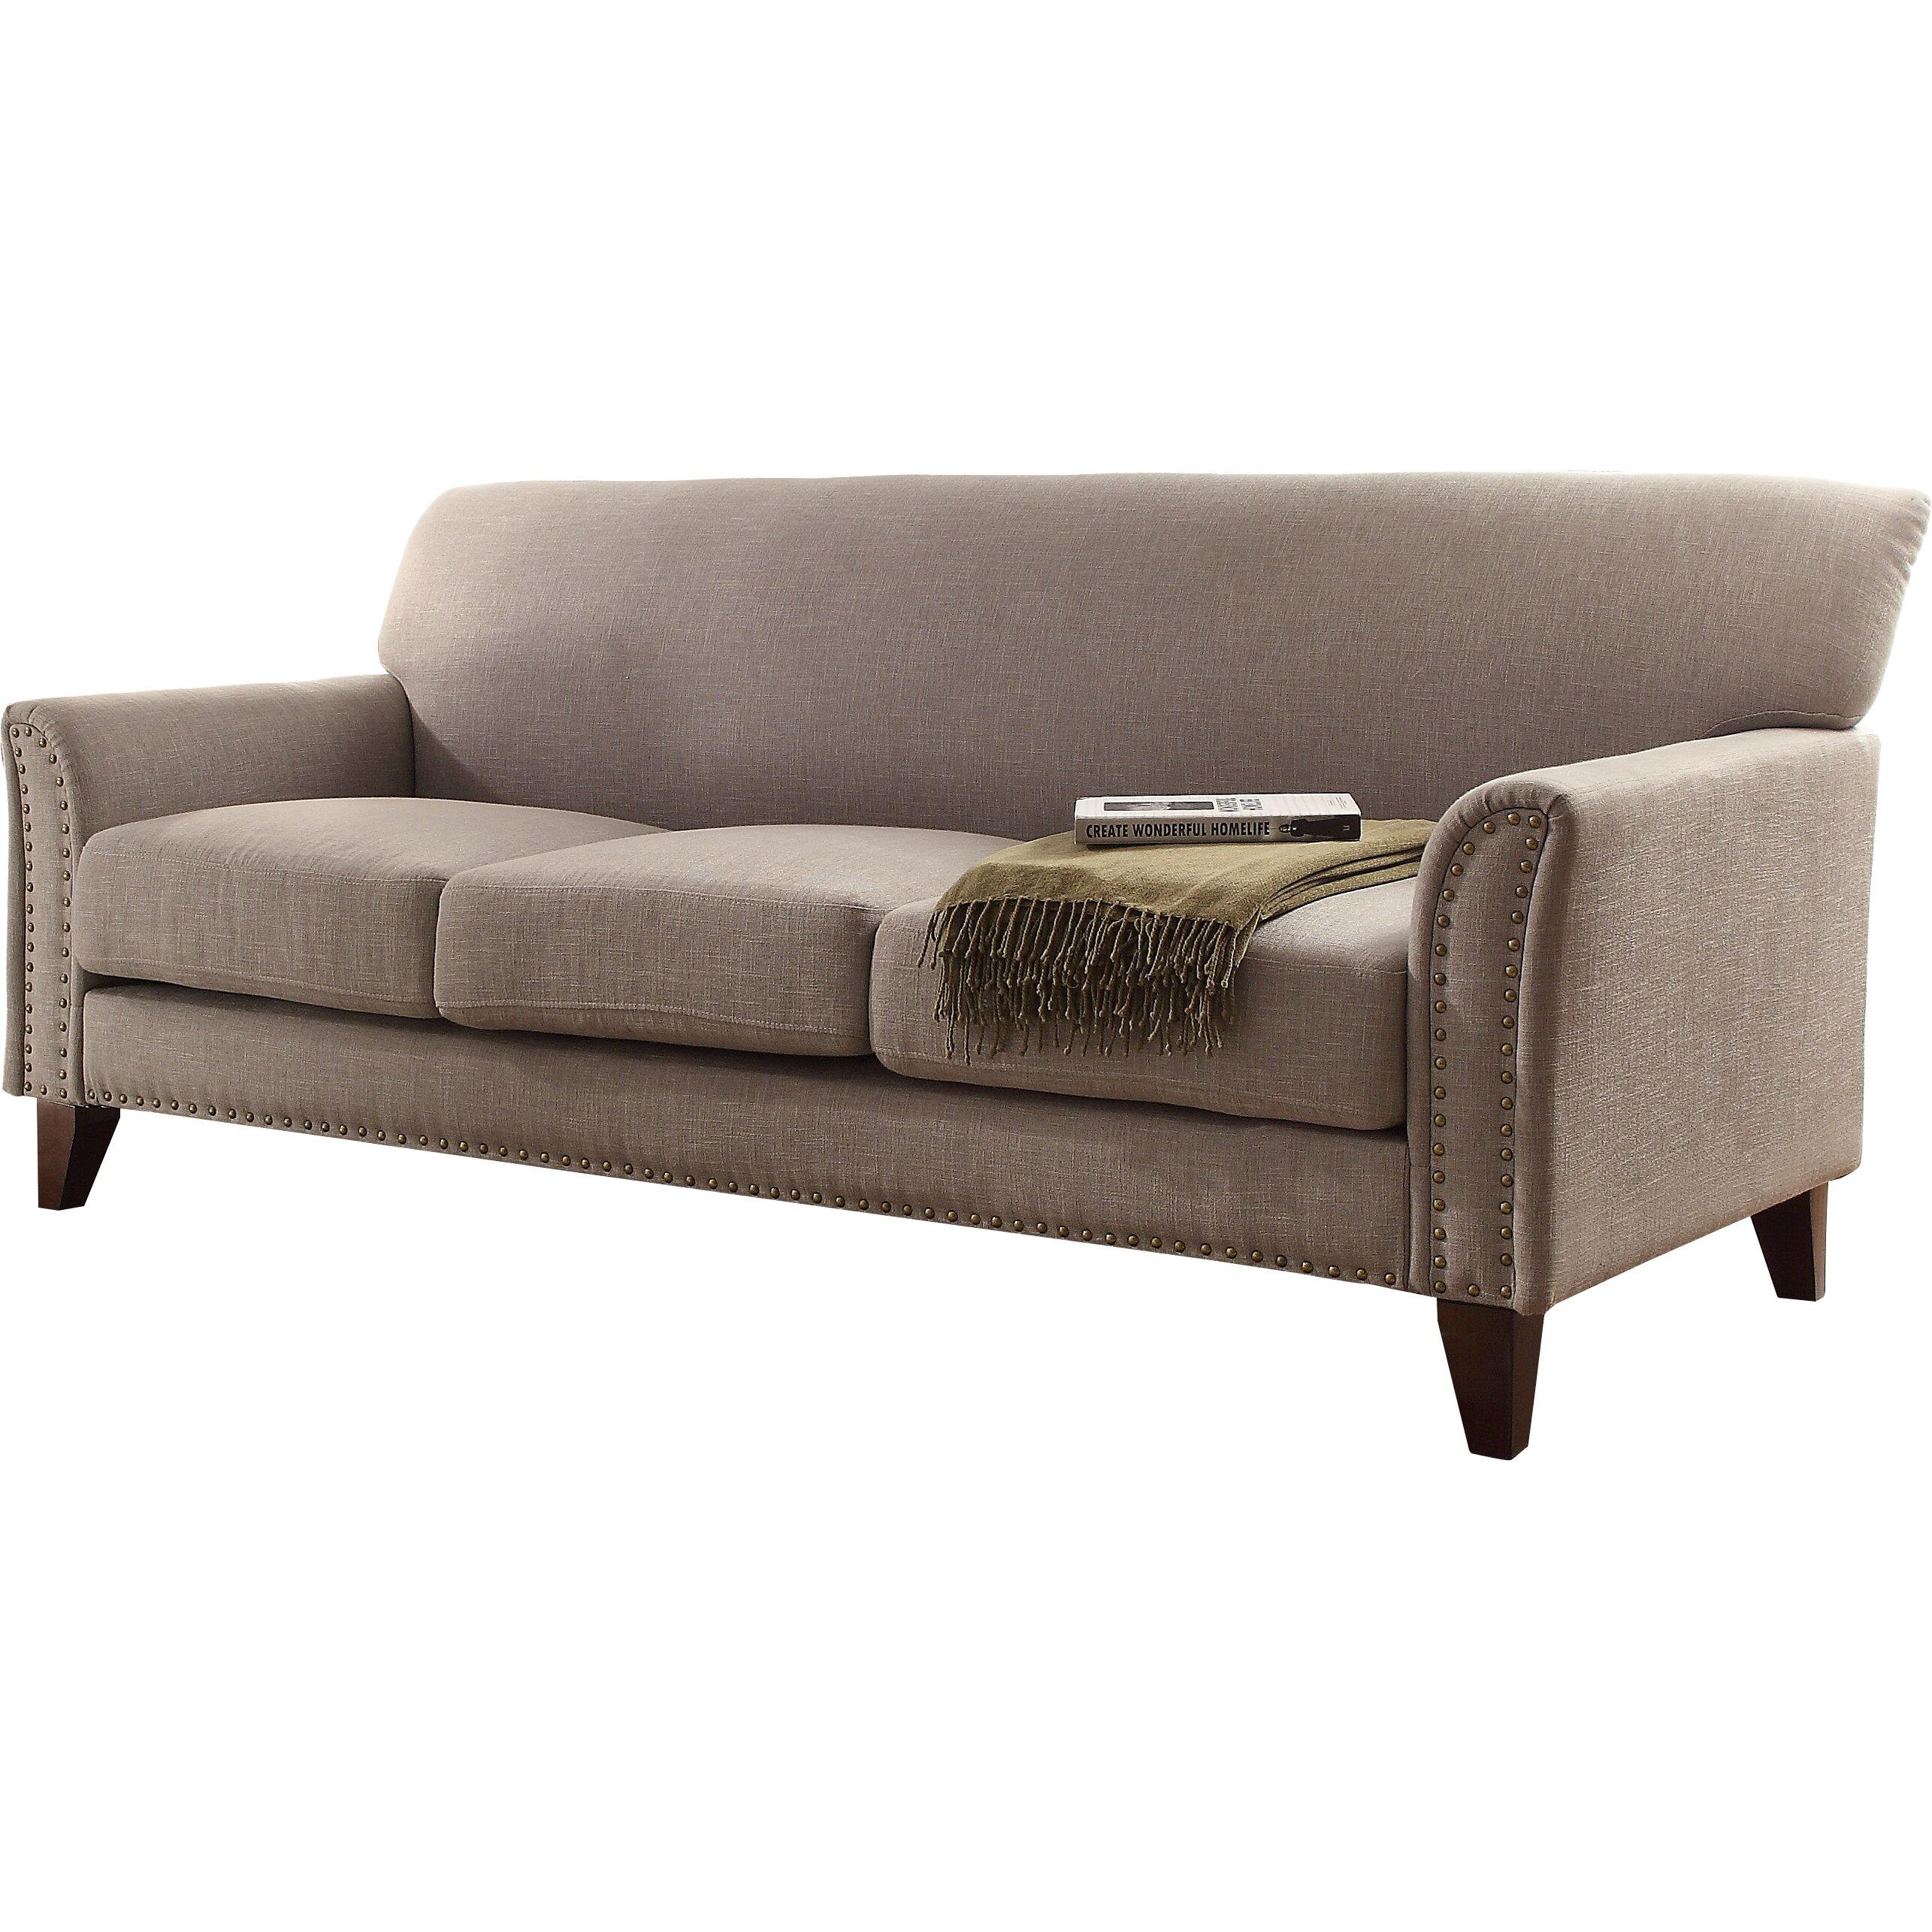 Laurel Foundry Modern Farmhouse Living Room: Laurel Foundry Modern Farmhouse™ Adoria Sofa & Reviews